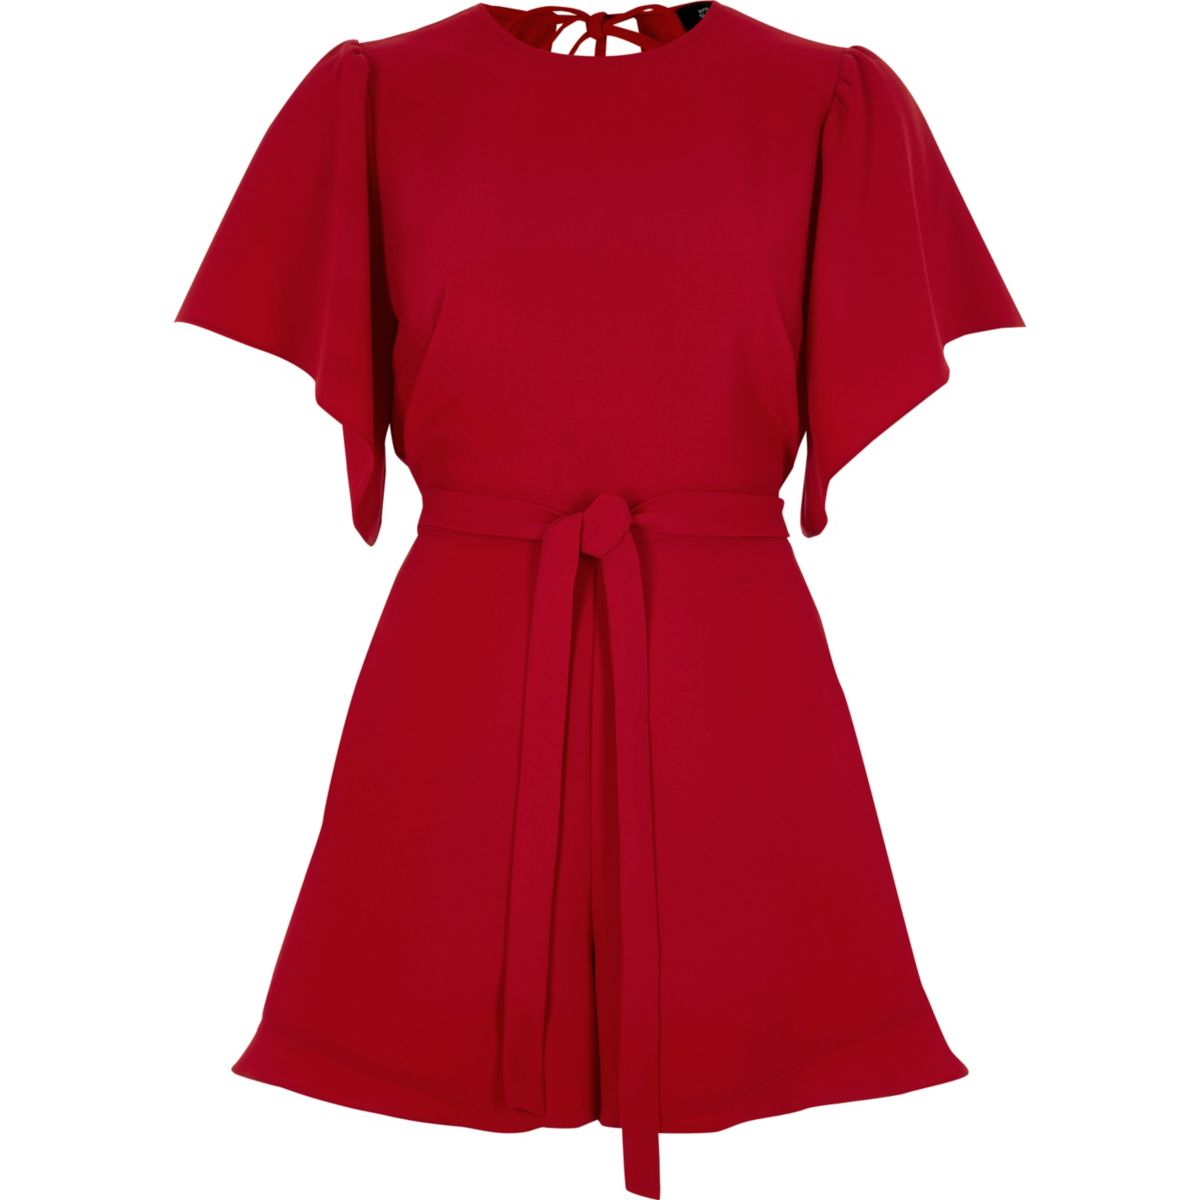 Red tie waist short sleeve romper